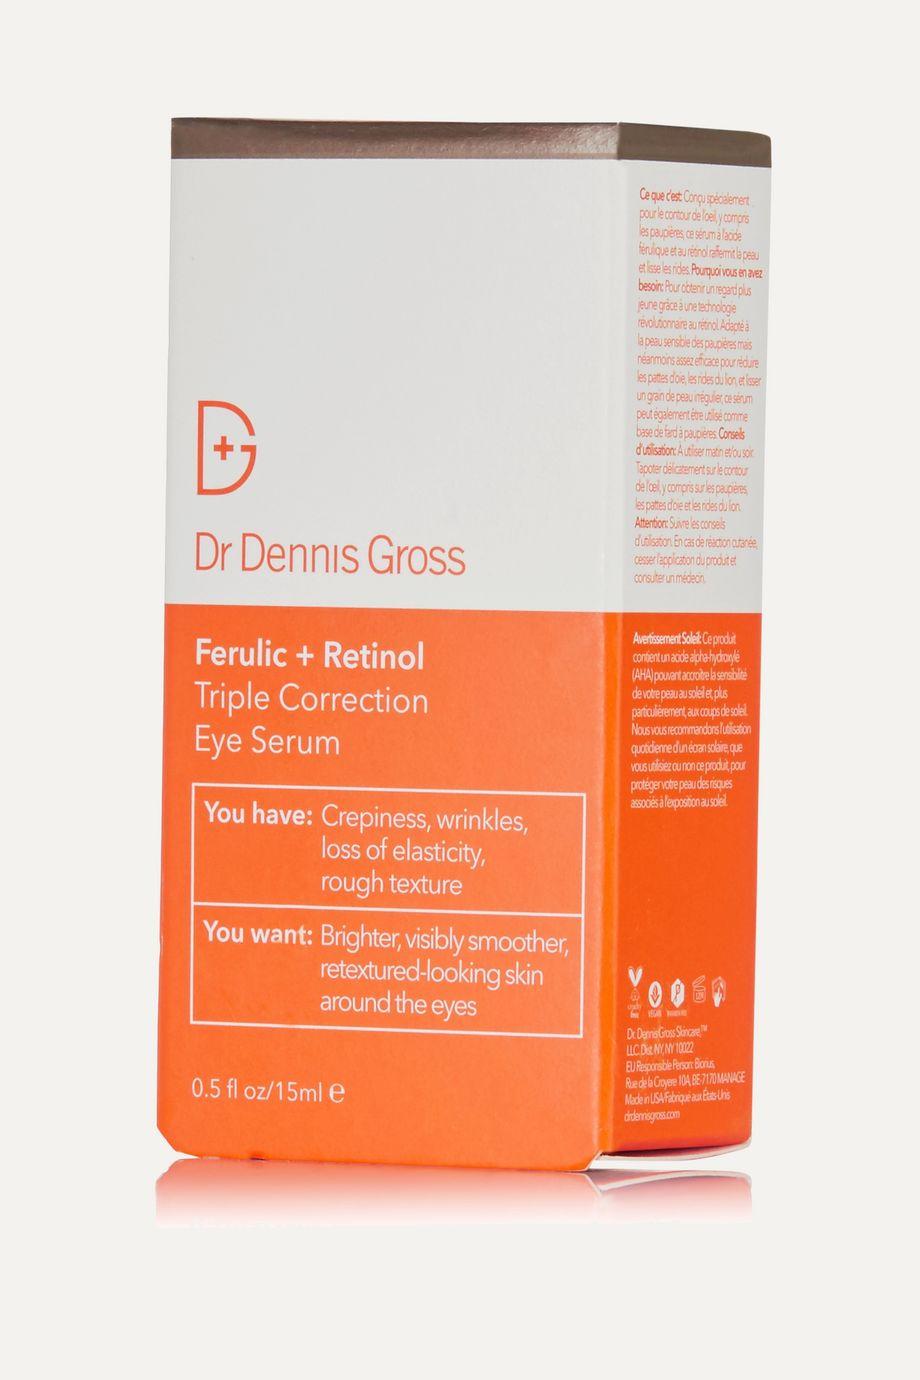 Dr. Dennis Gross Skincare Ferulic + Retinol Triple Correction Eye Serum, 15ml